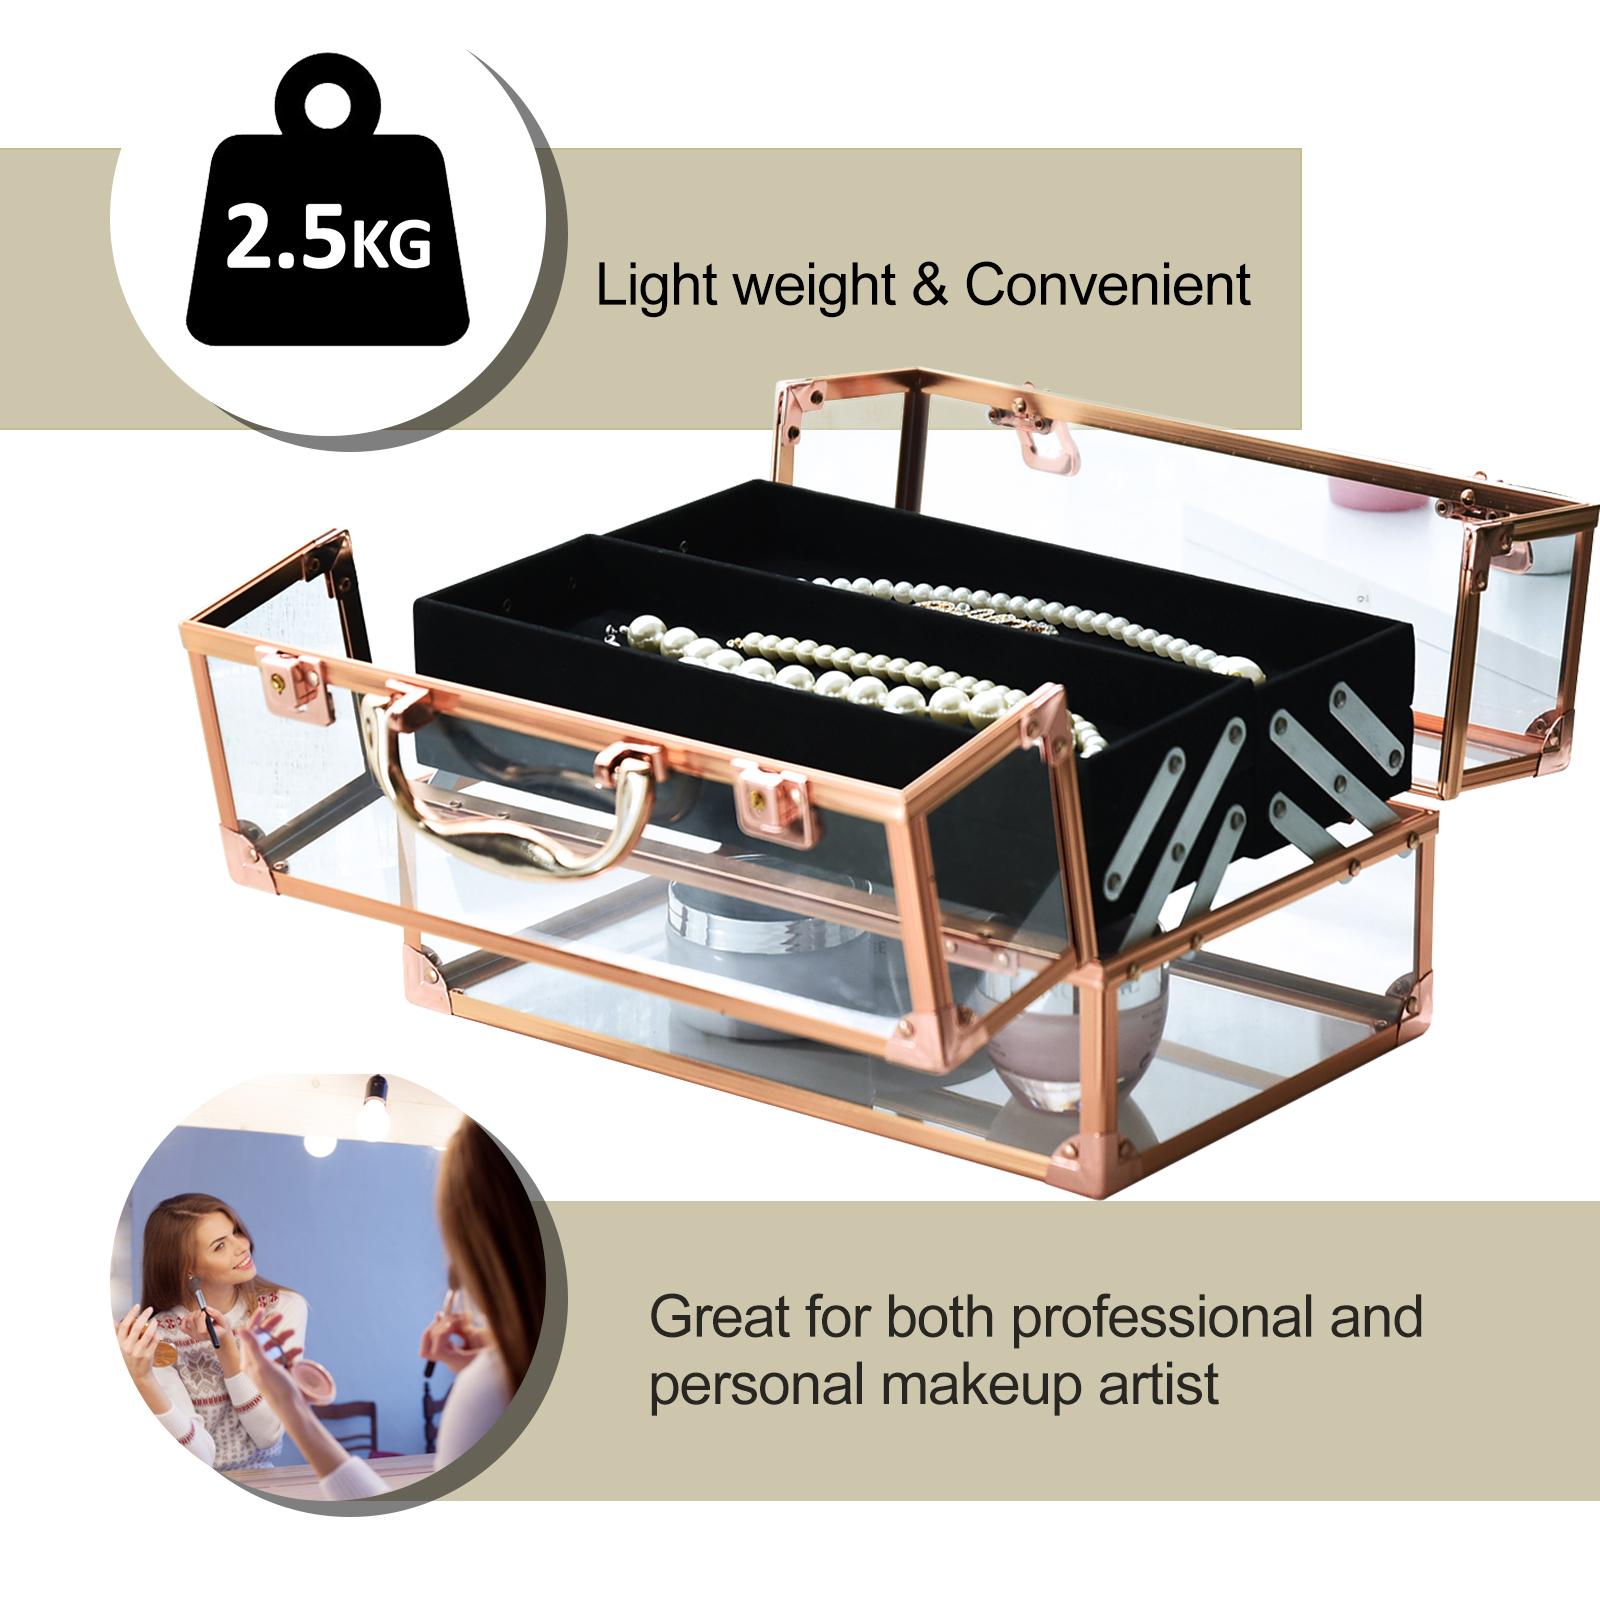 Portable-Makeup-Case-Train-Case-Lockable-Aluminum-with-4-Trays thumbnail 13